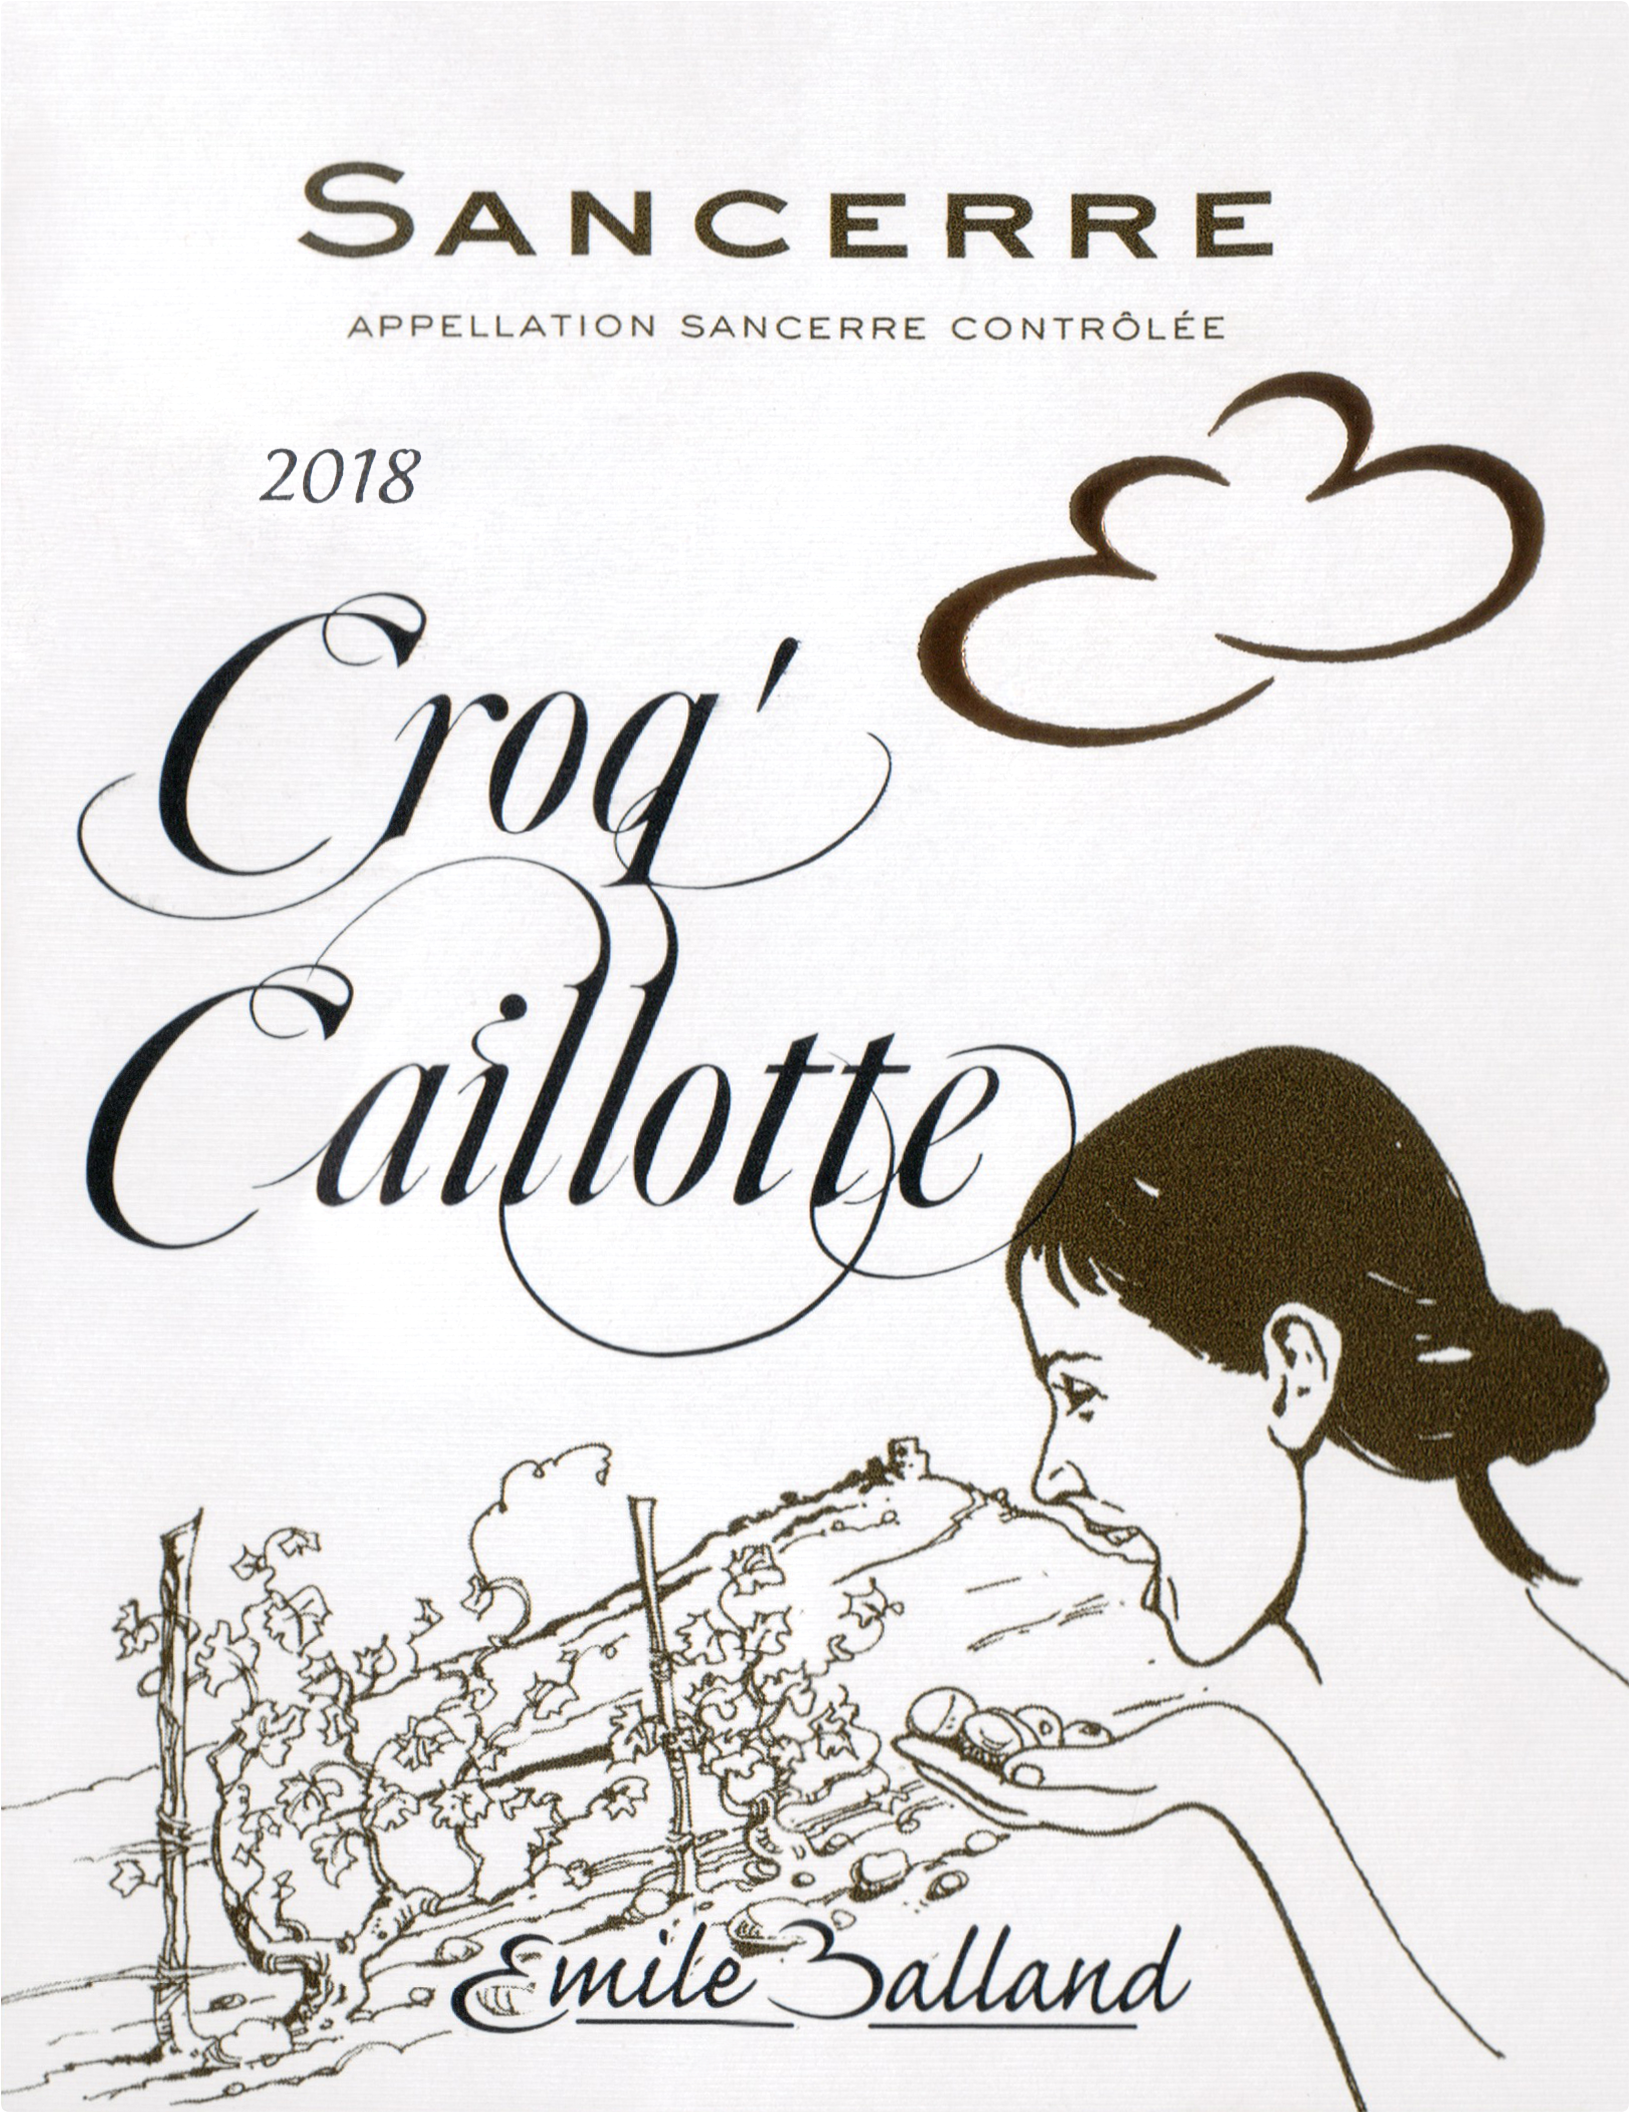 Emile Balland Sancerre Croq